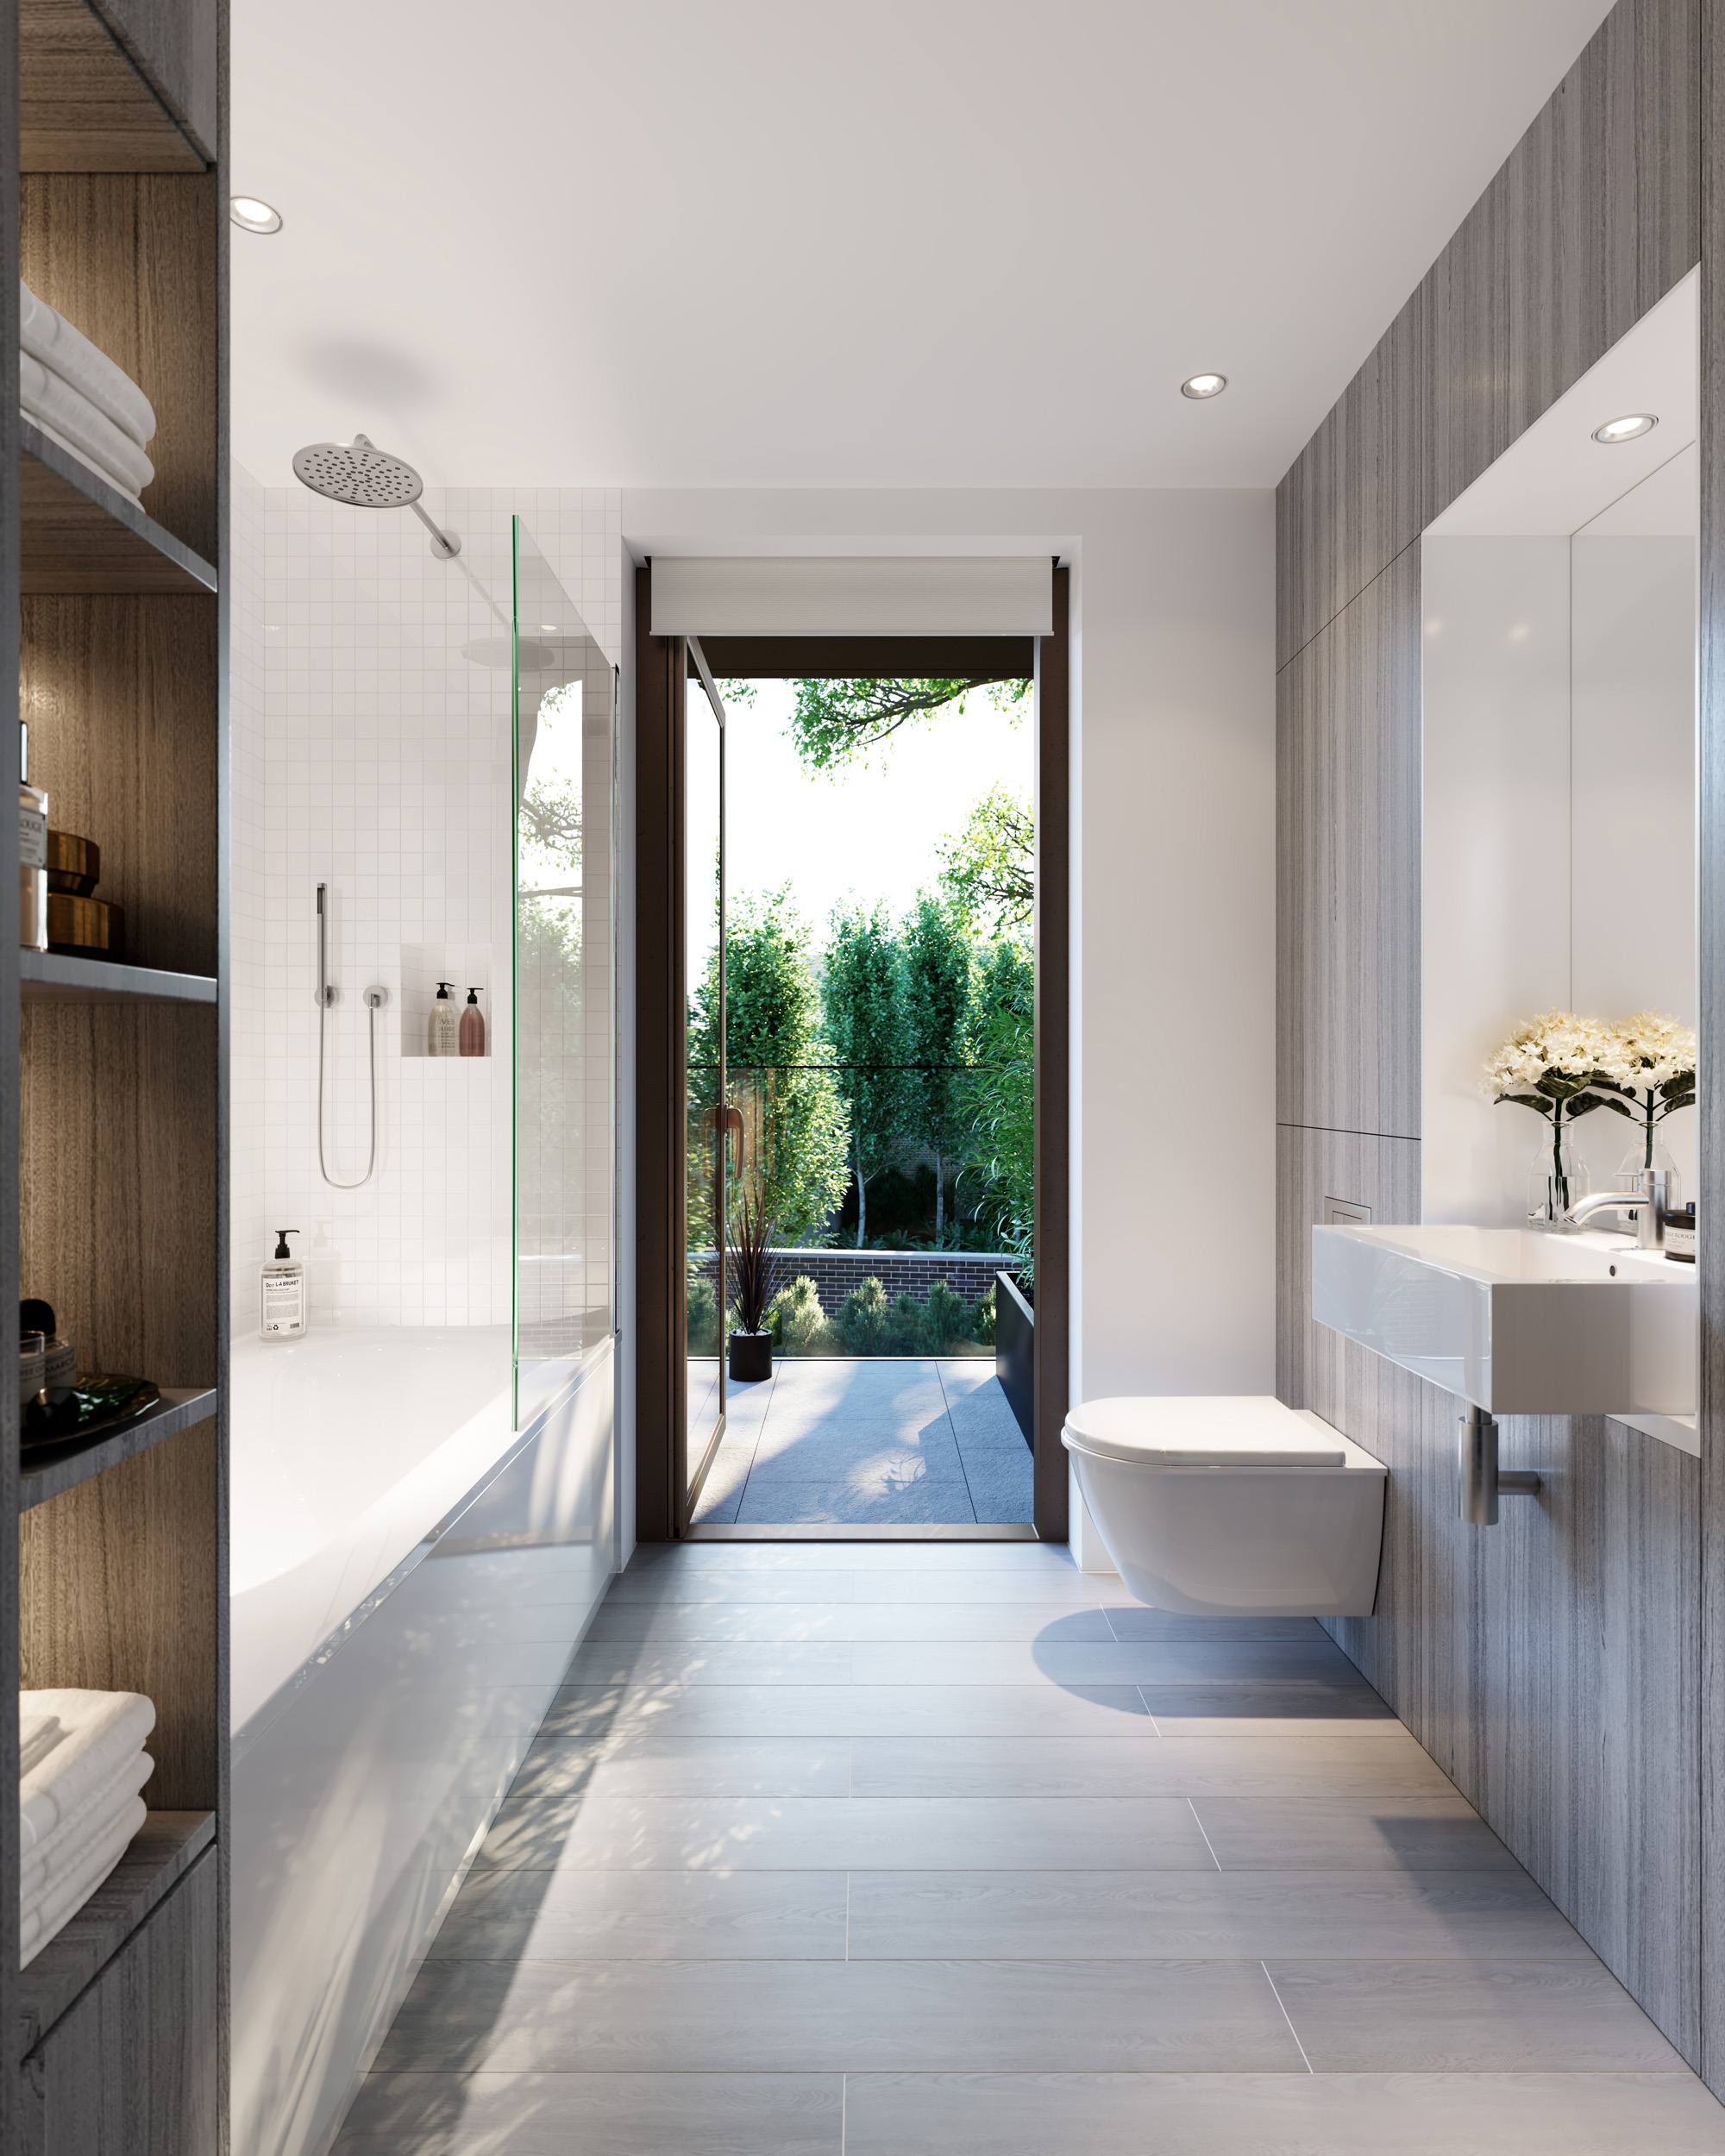 SJHP_View_06_Bathroom_Medium.jpg